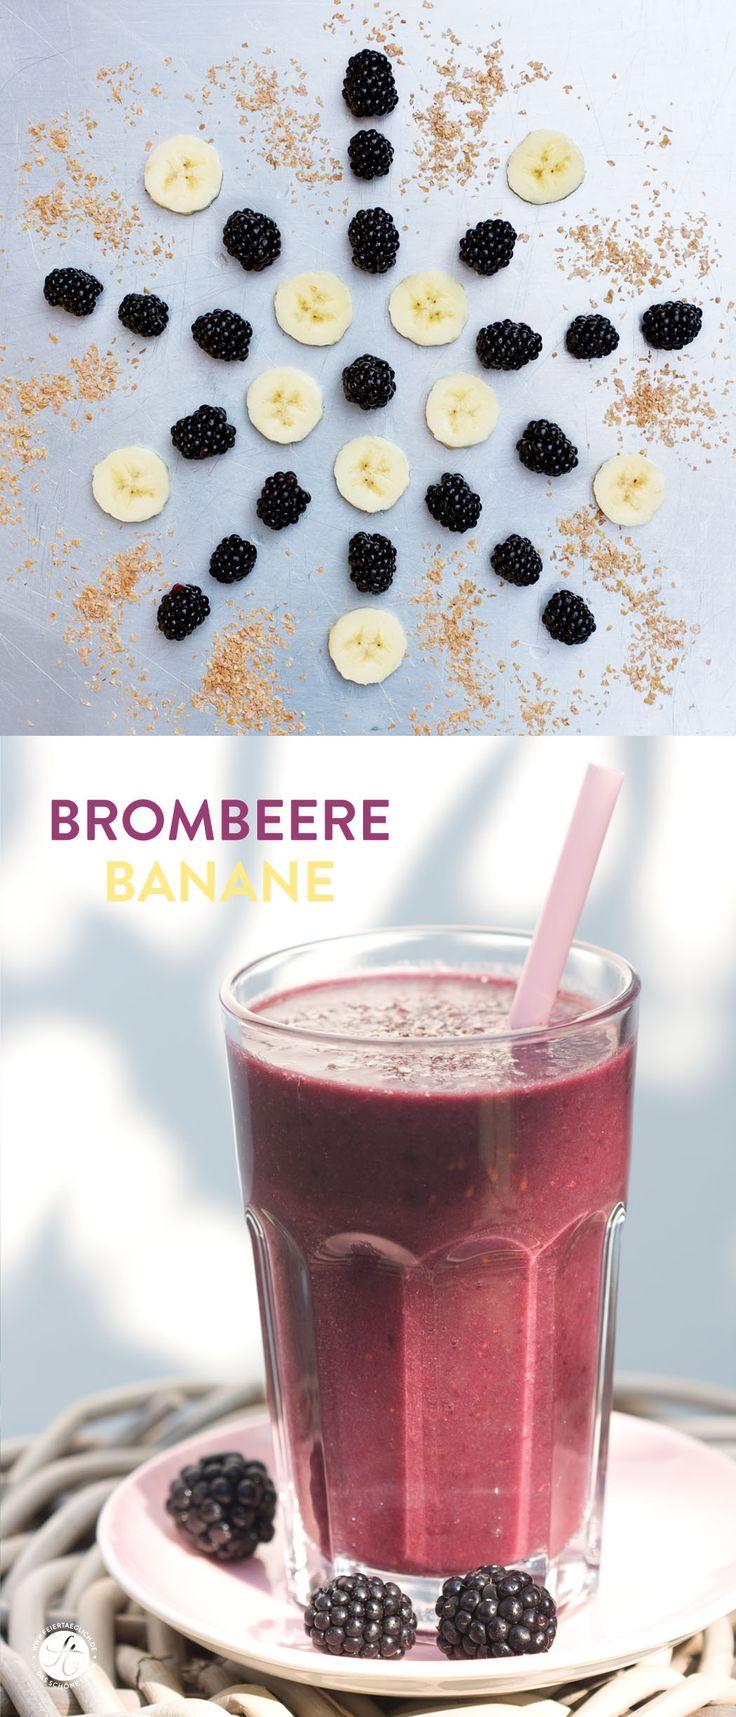 SmoothieMontag | Brombeere Banane Smoothie | Blackberry Banana Smoothie #feiertaeglich #smoothiemontag